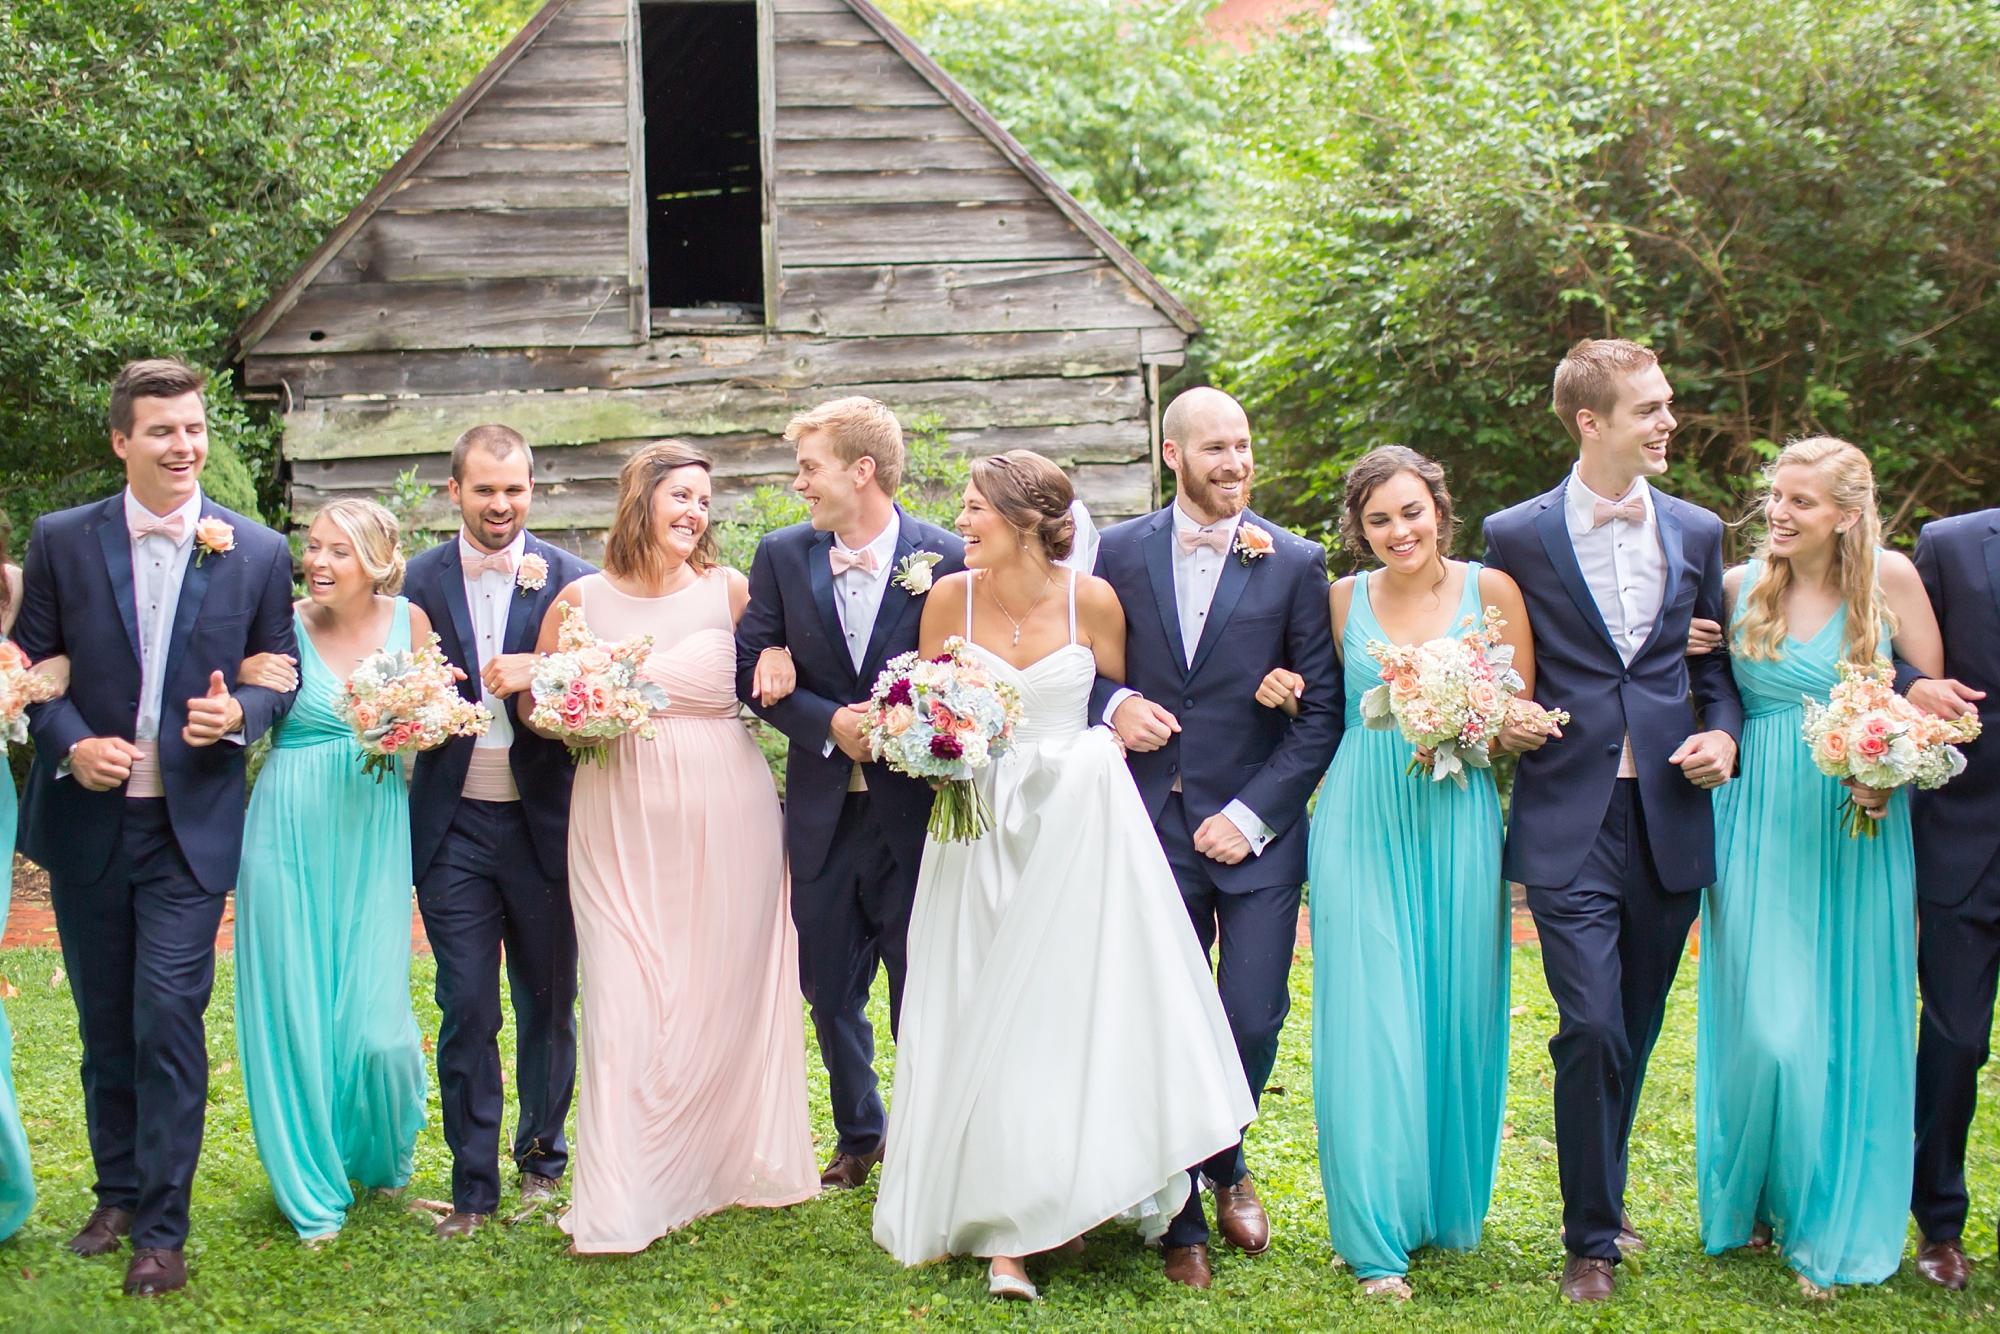 Russell 2-Bridal Party-734_anna grace photography baltimore maryland wedding photographer elkridge furnace inn wedding photo.jpg